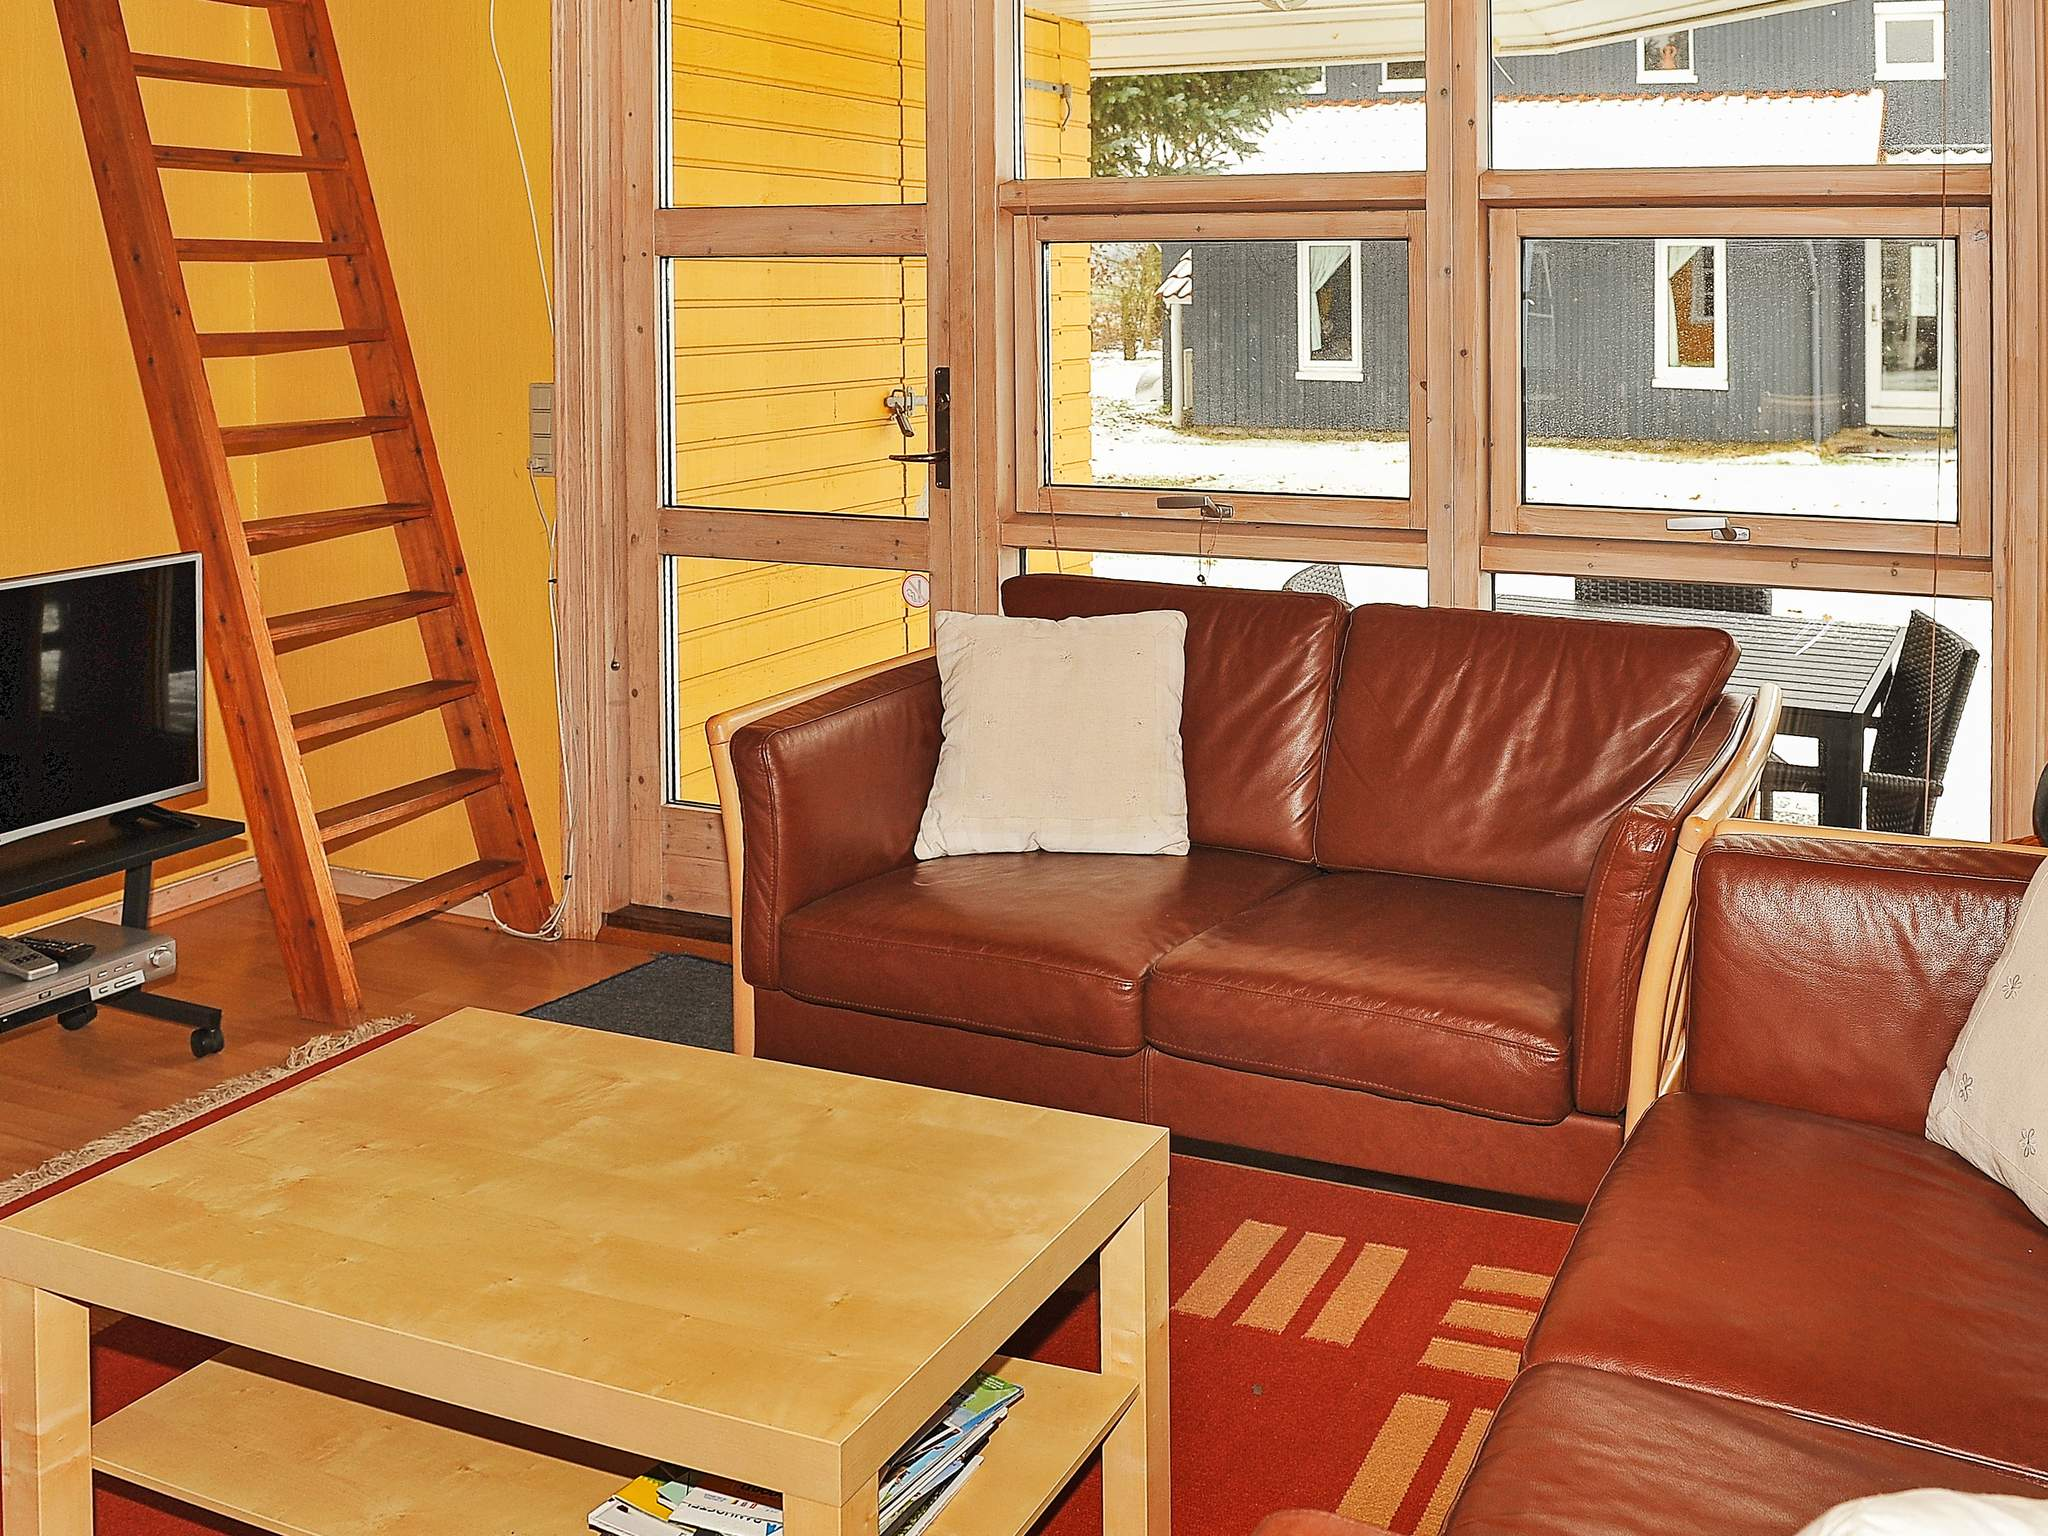 Ferienhaus Hovborg (404747), Hovborg, , Südwestjütland, Dänemark, Bild 3